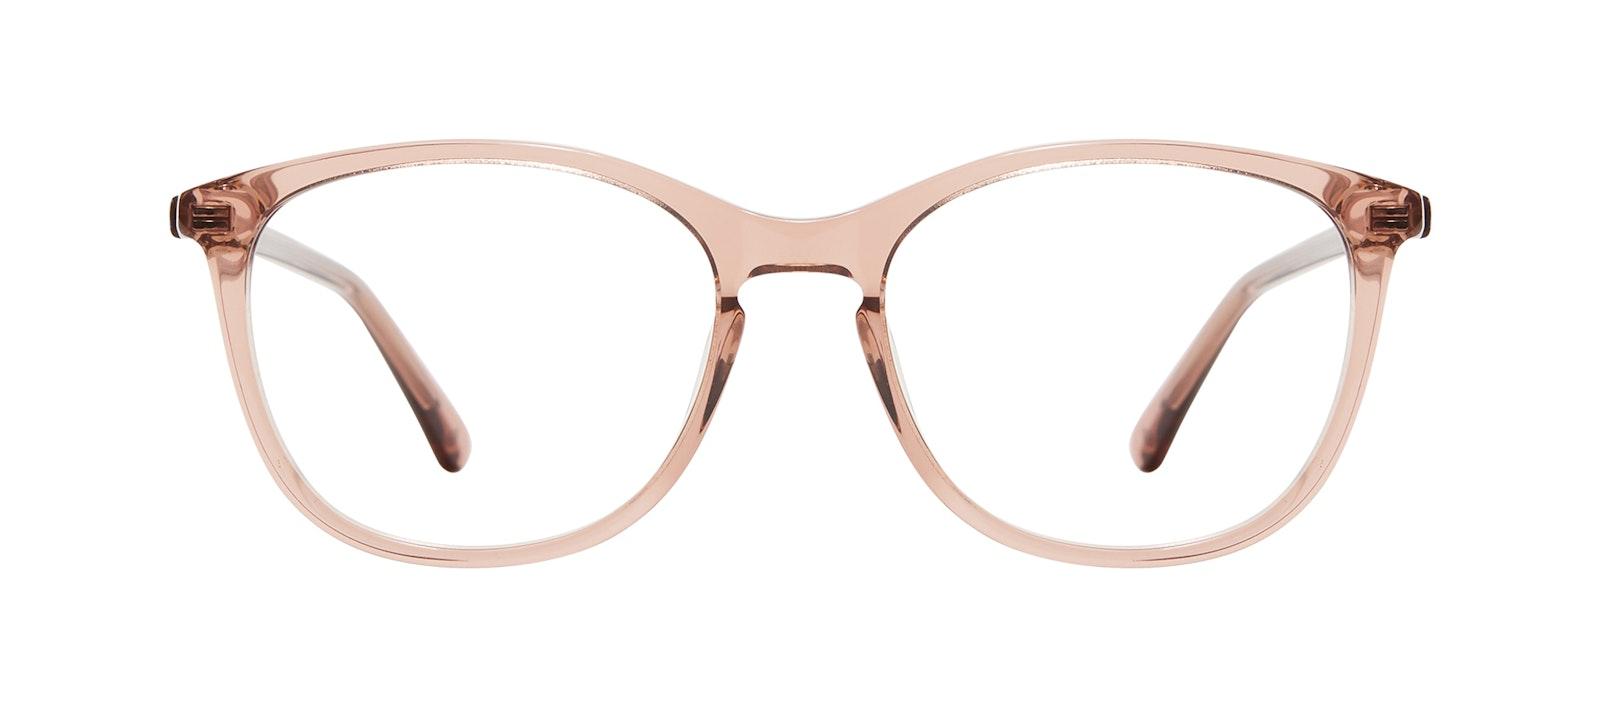 Affordable Fashion Glasses Rectangle Square Round Eyeglasses Women Nadine XL Rose Front